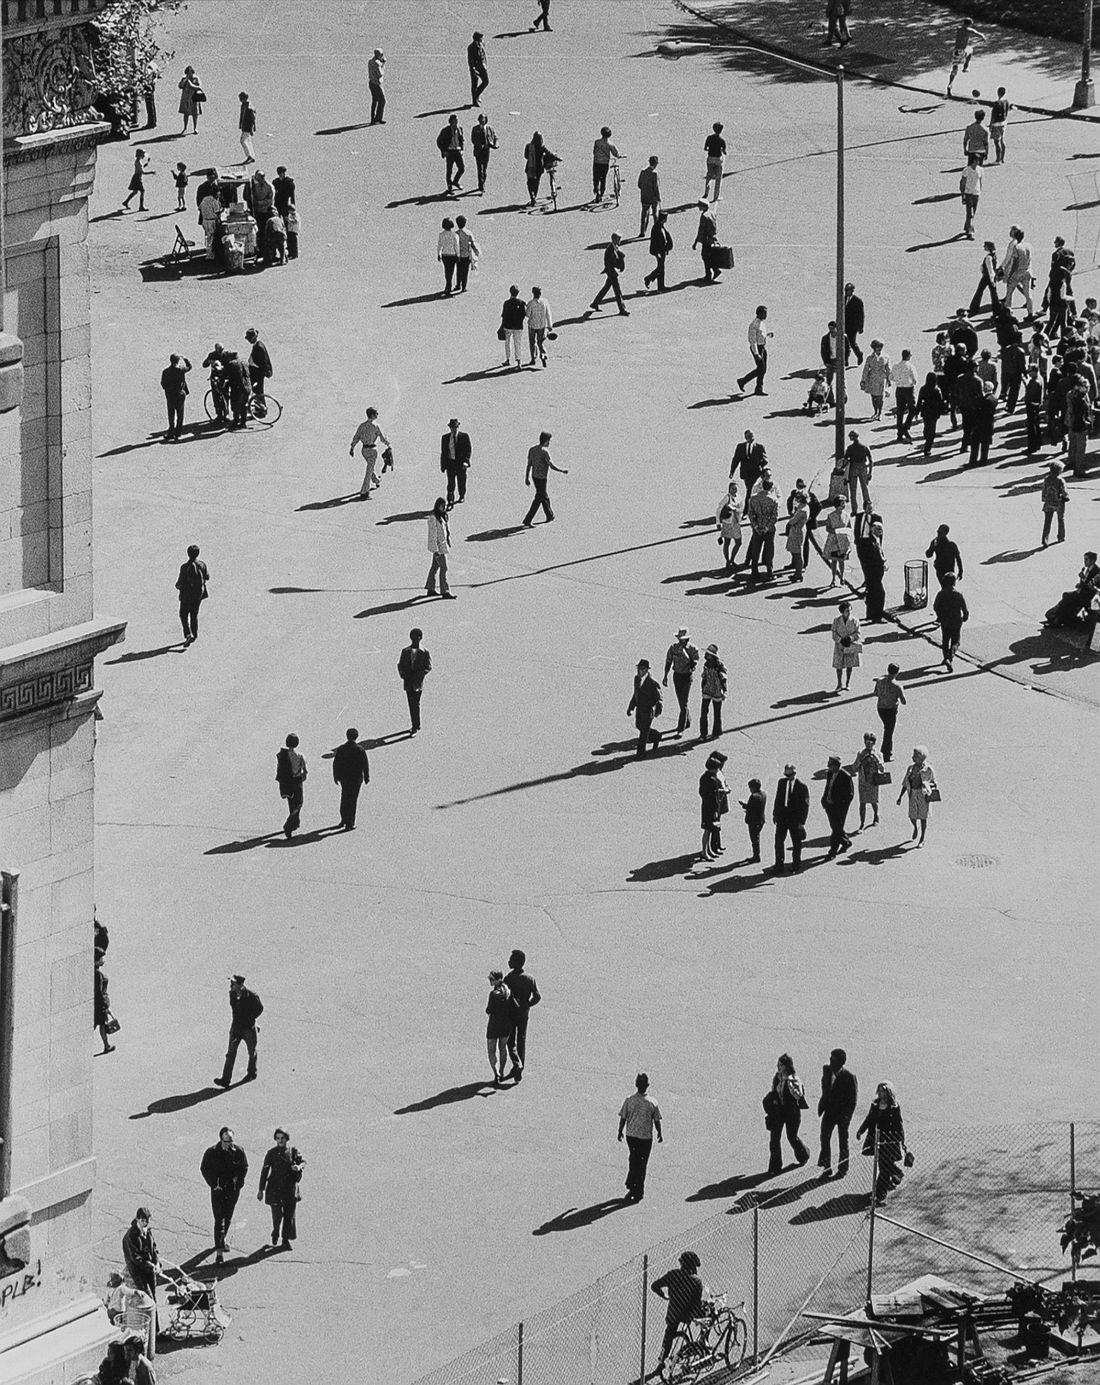 Birds Eye View, Washington Square Park, September 25, 1969, 1969